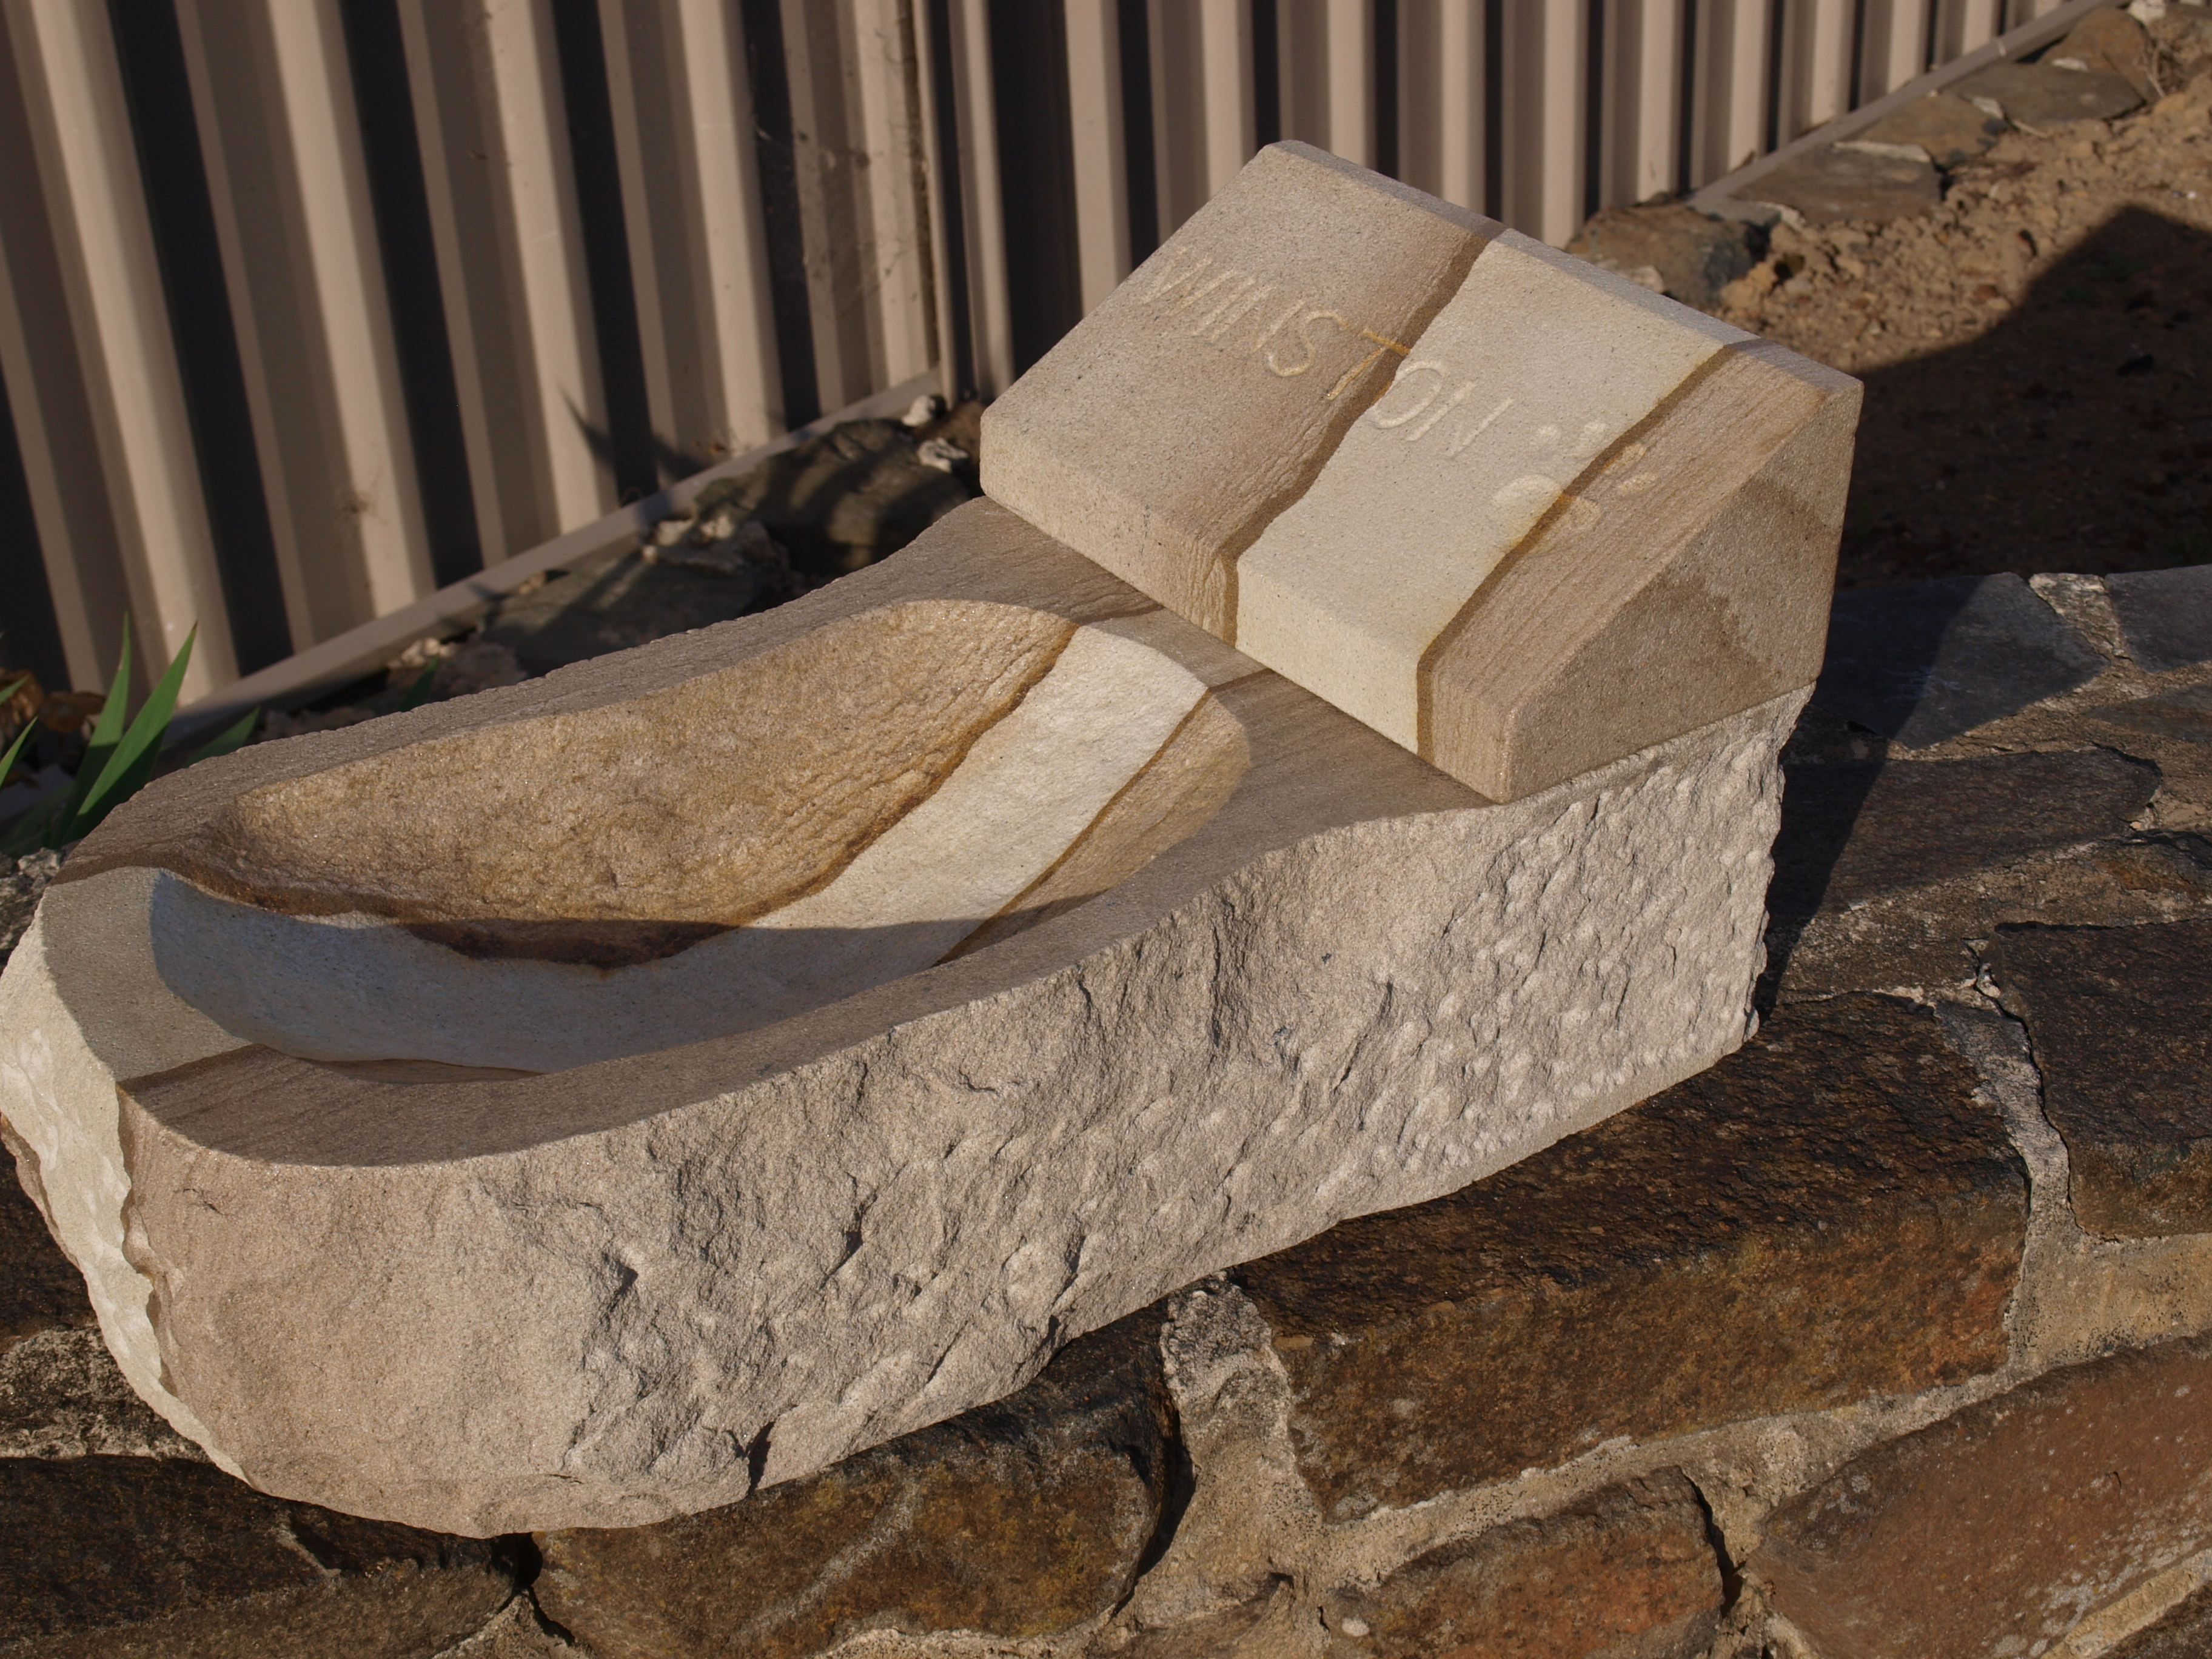 Pet Memorial Stone with Water Bowl